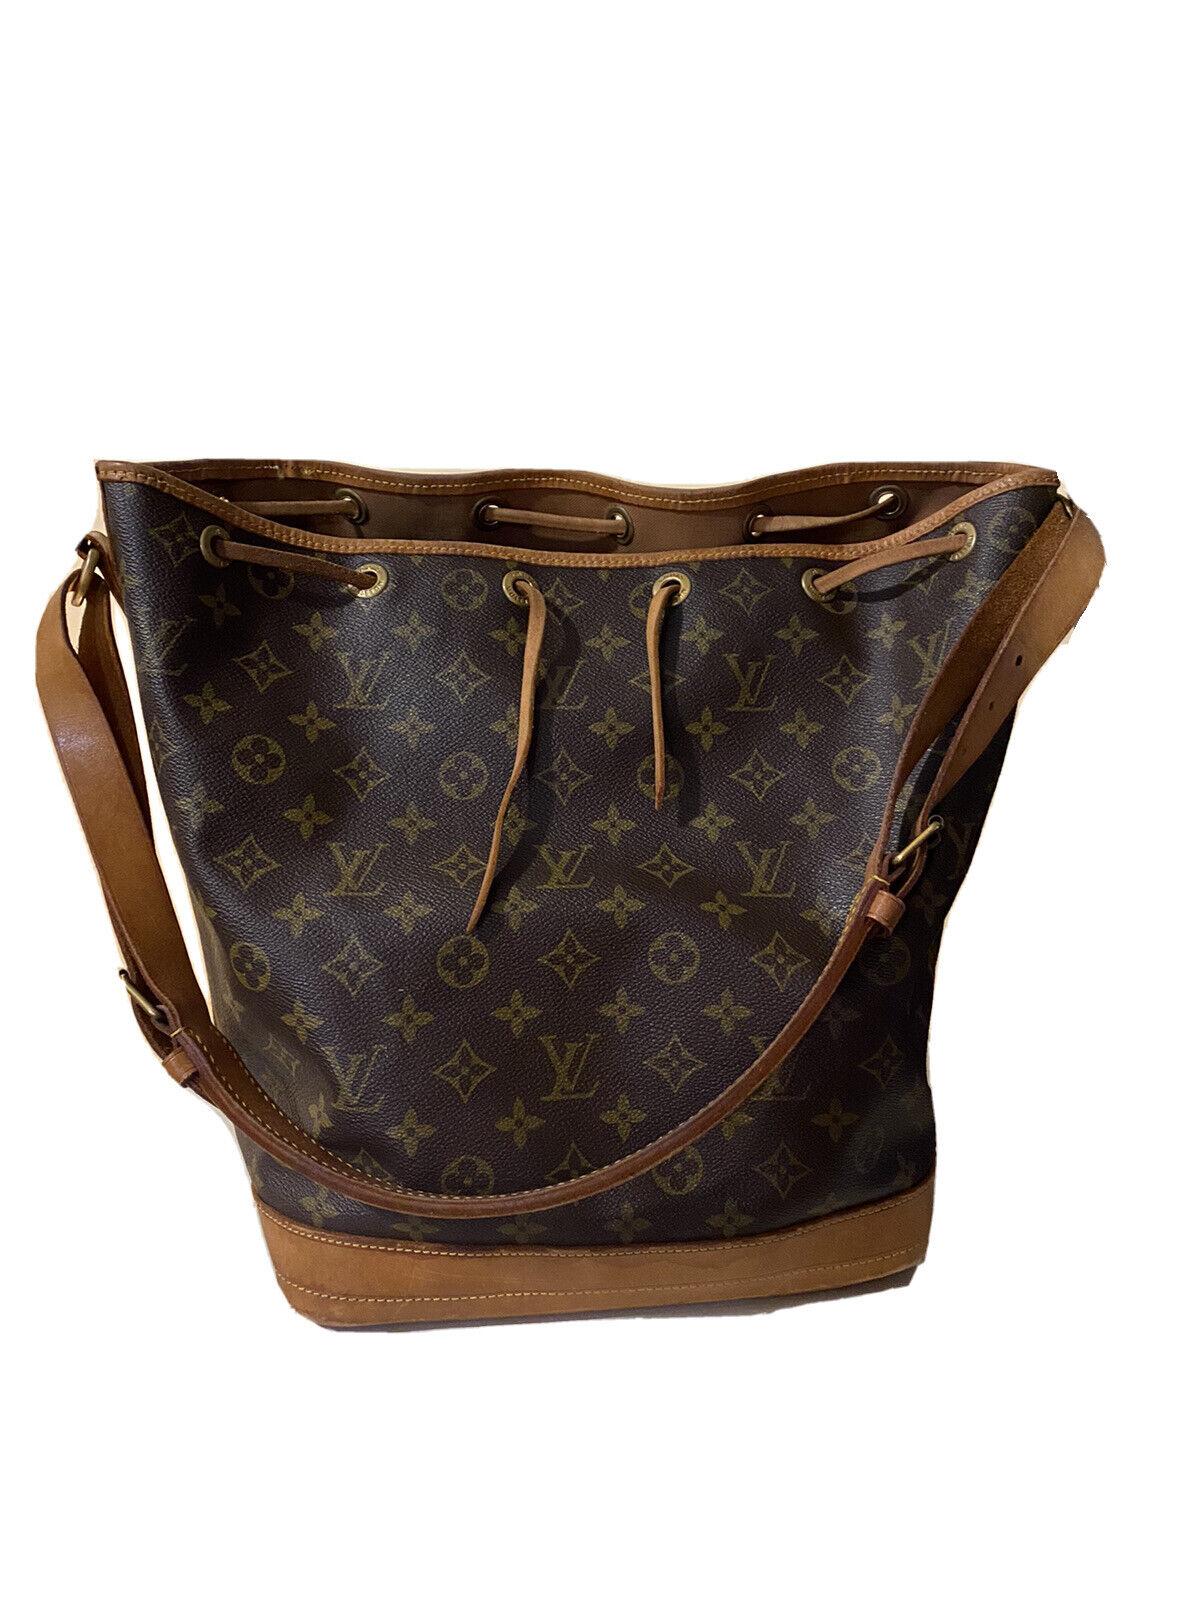 Louis Vuitton Monogram NOE - image 1